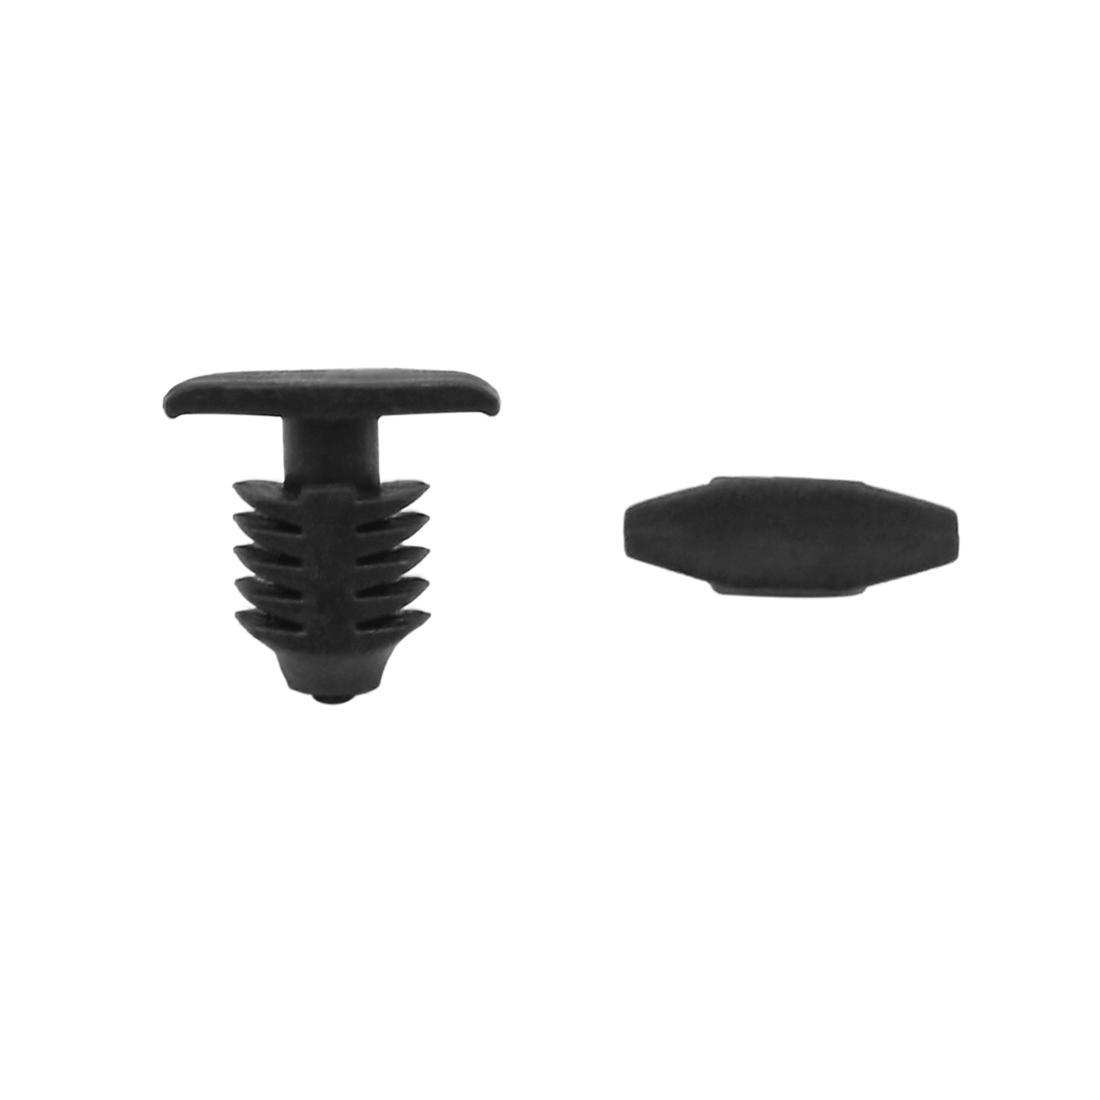 40 Pcs 13mm x 5mm Head Dia Plastic Rivets Fastener Clips Black for Car Auto